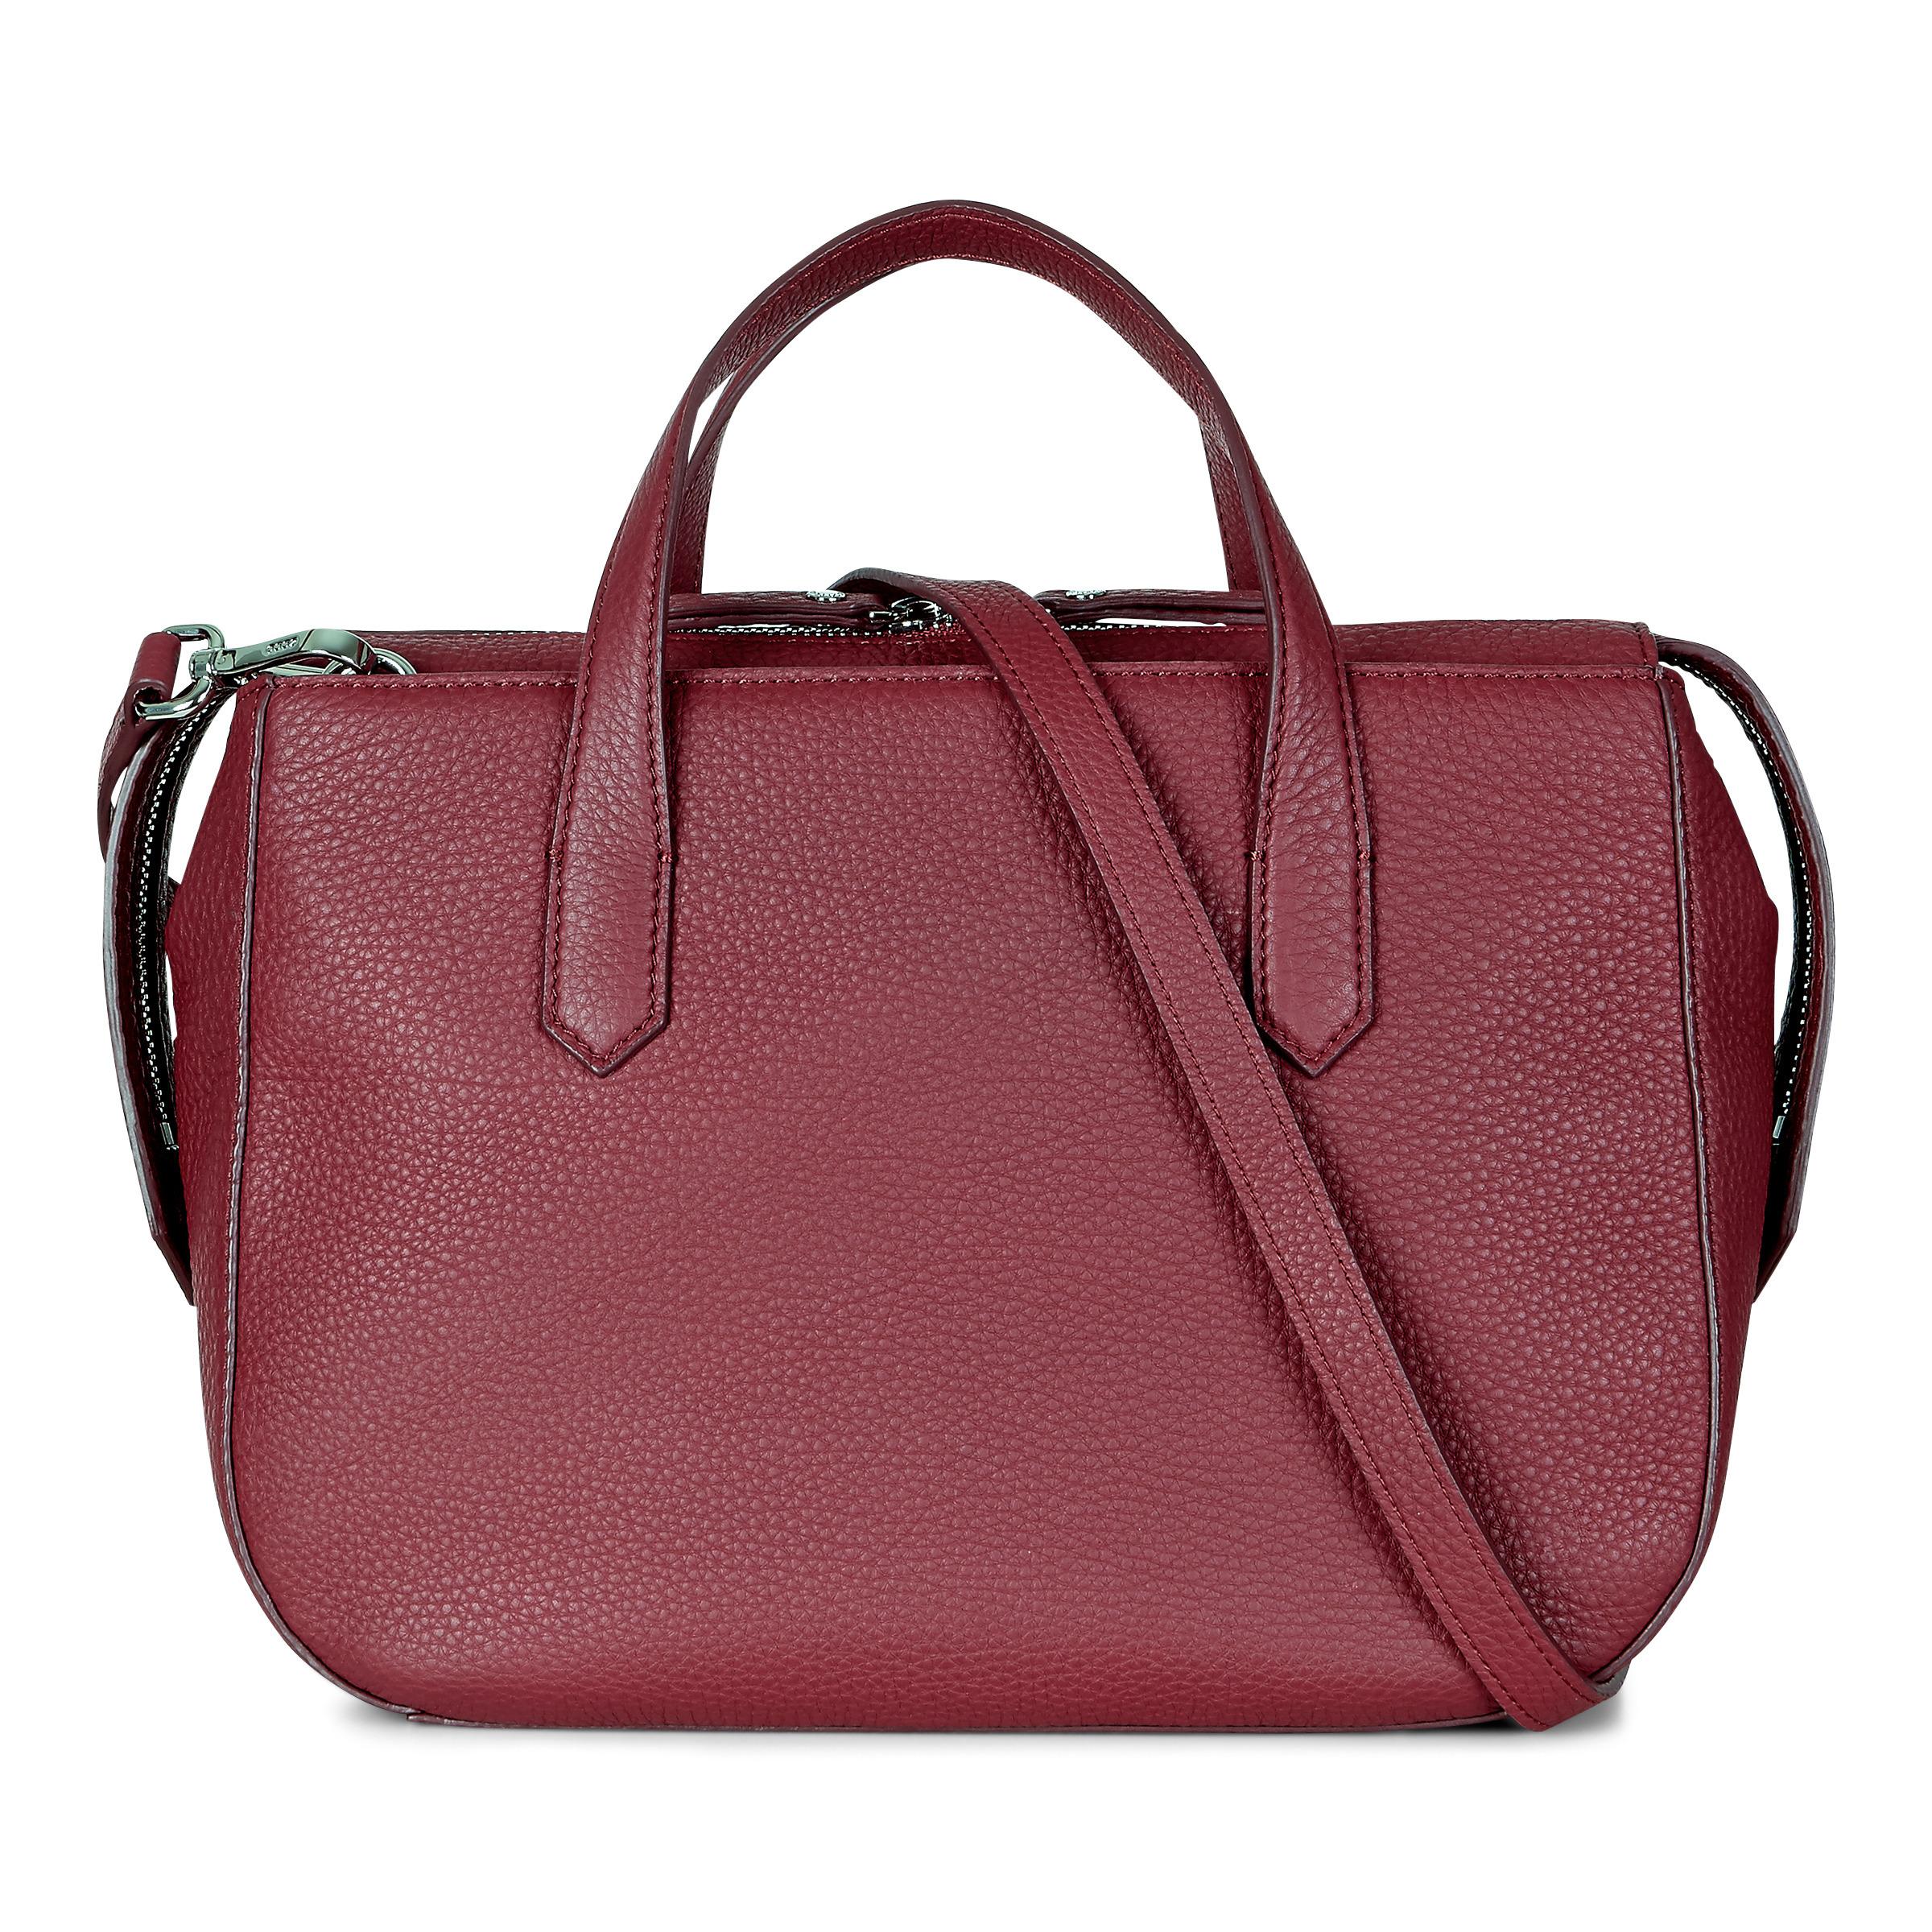 Image of ECCO Kauai Handbag